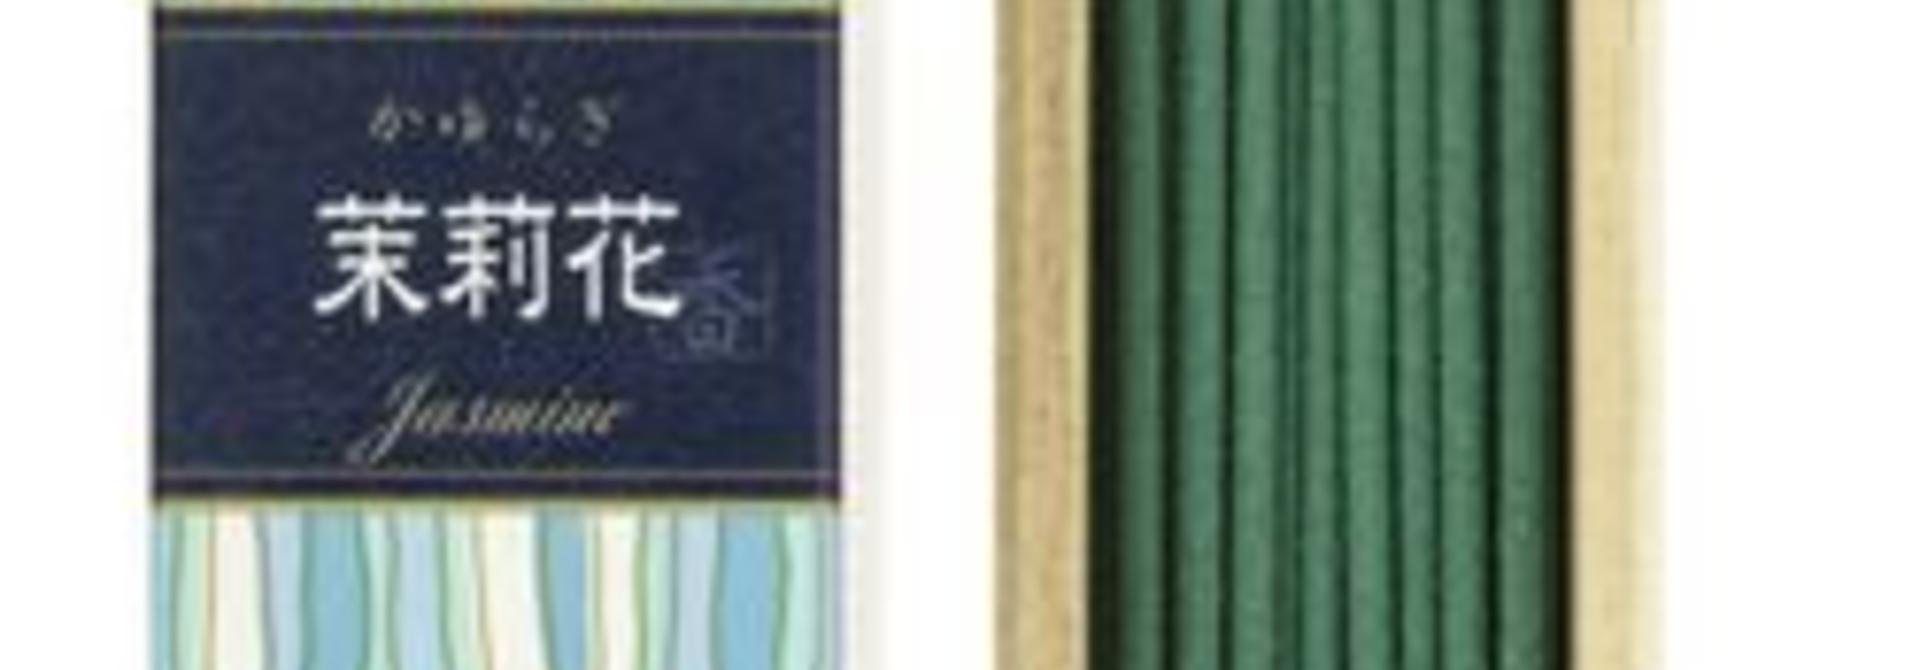 TIERRA ZEN - Kayuragi Jasmine Incense